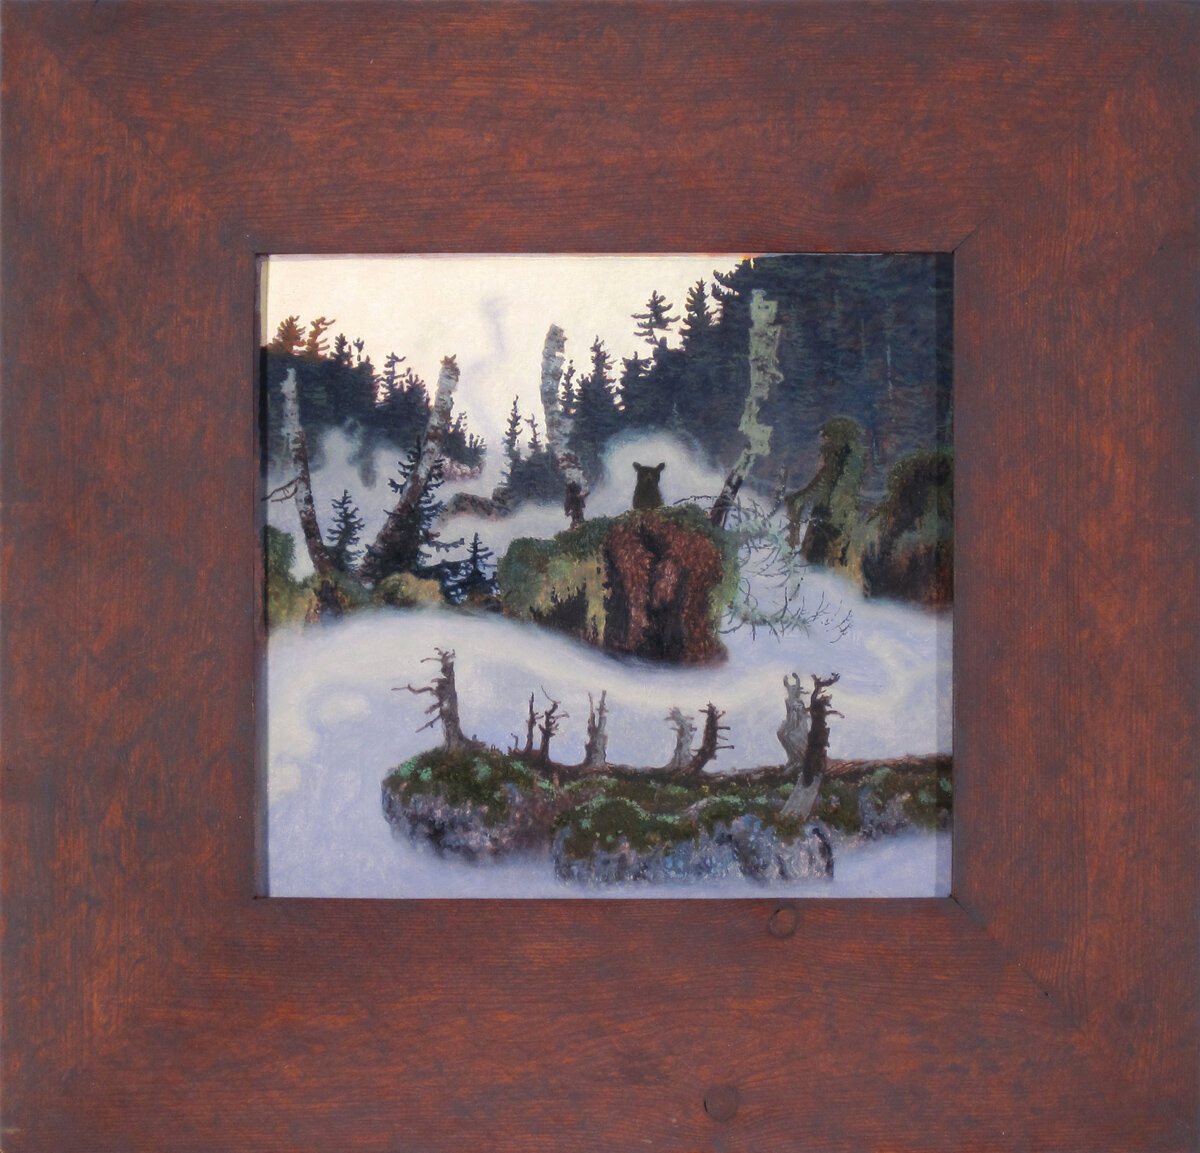 "AKANDOWNINI (911), Oil on Museum Board, 15 3/4 x 16 1/2"""